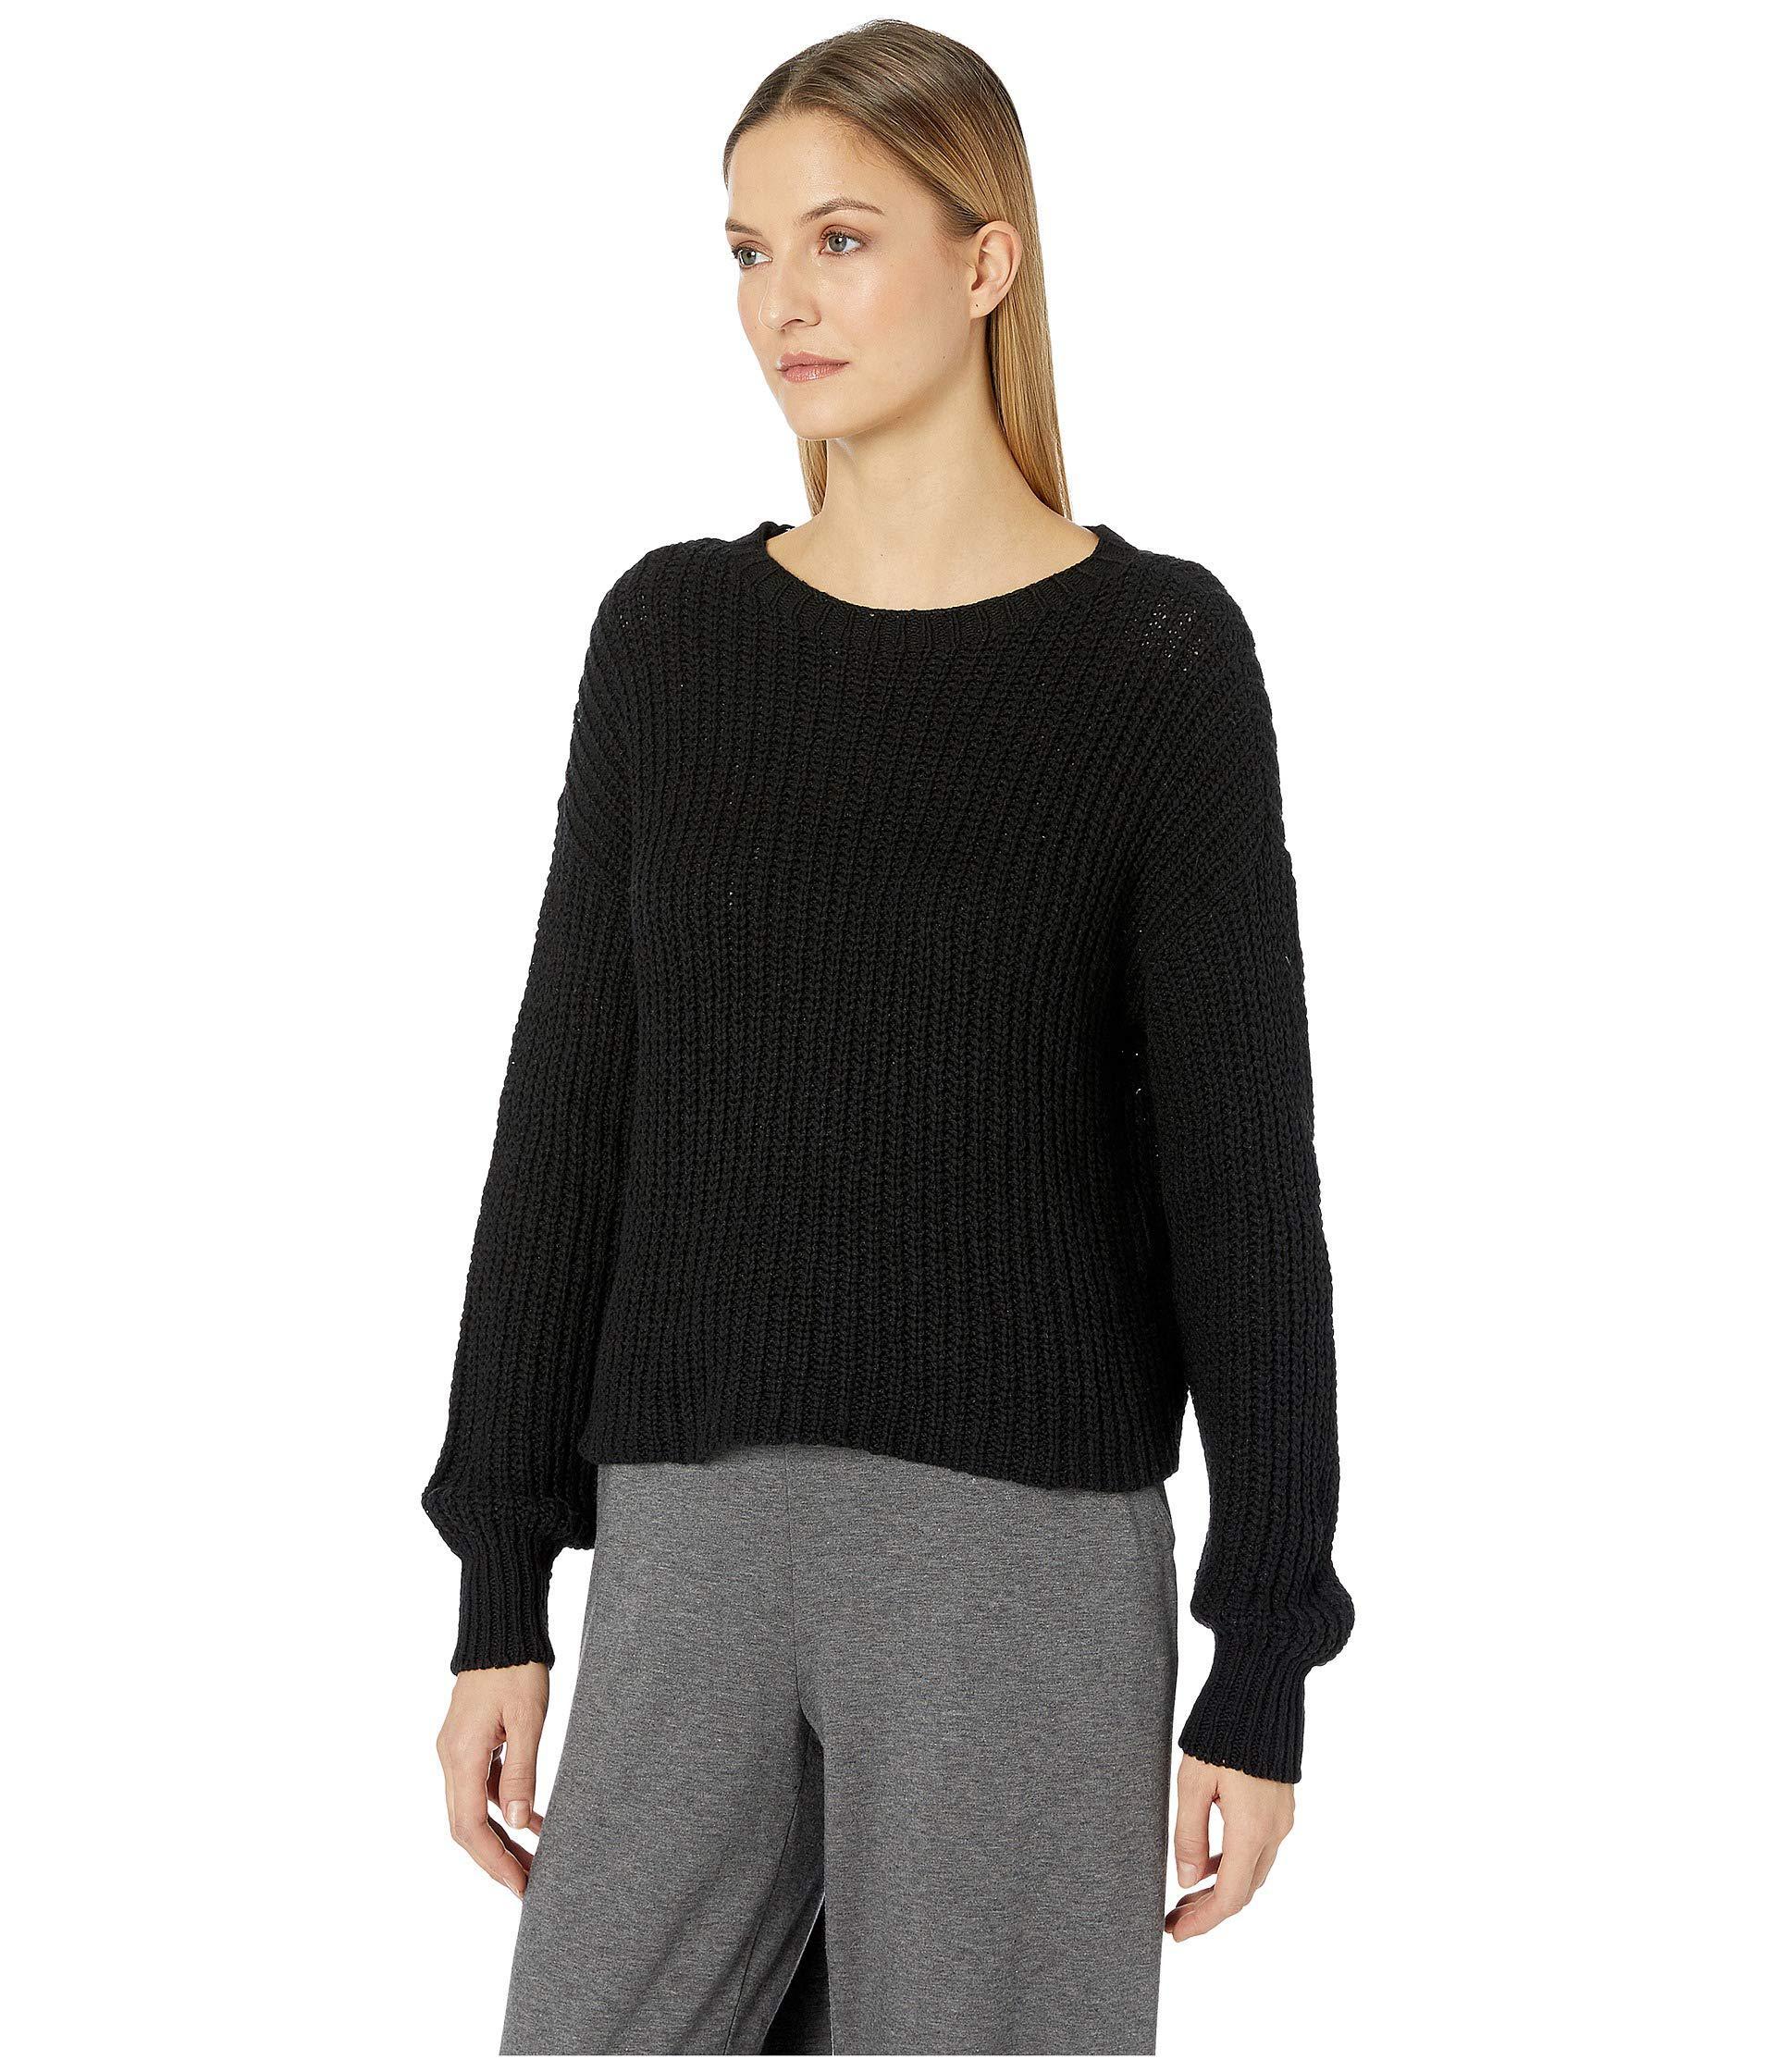 8ee0add973502 Lyst - Eileen Fisher Scoop Neck Top (black) Women s Sweater in Black